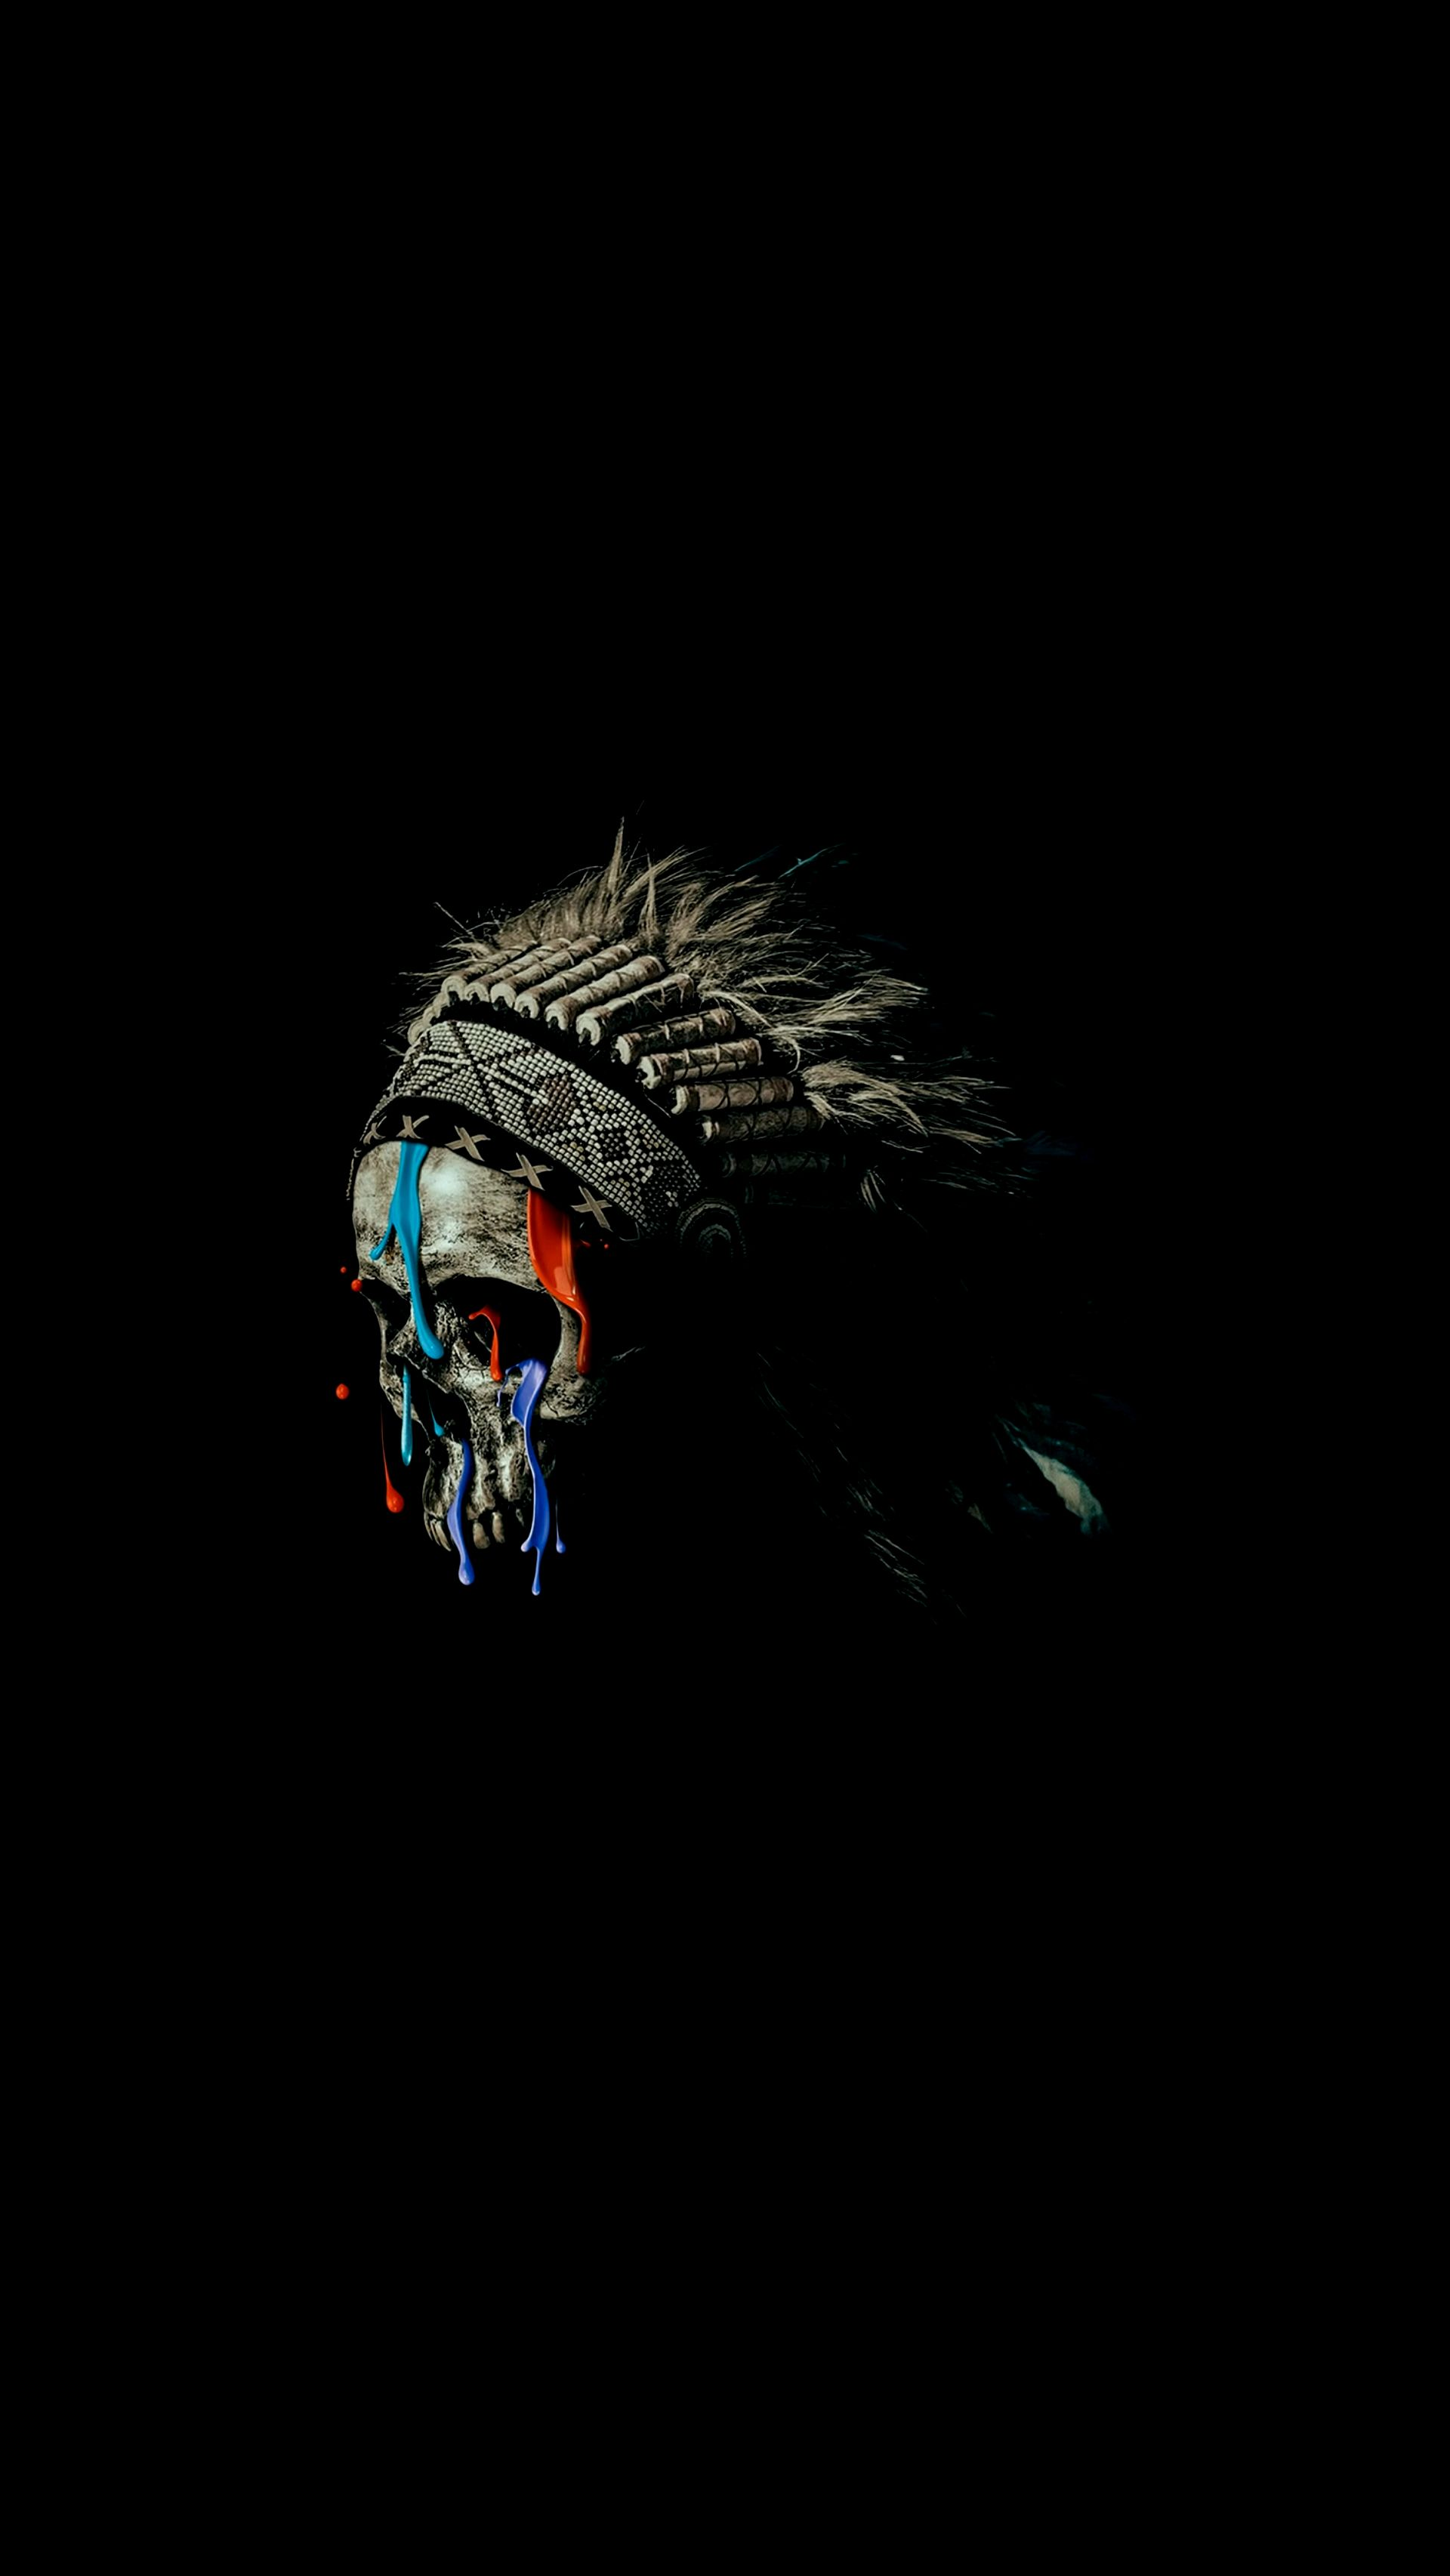 Native American Skull iPhone Wallpaper